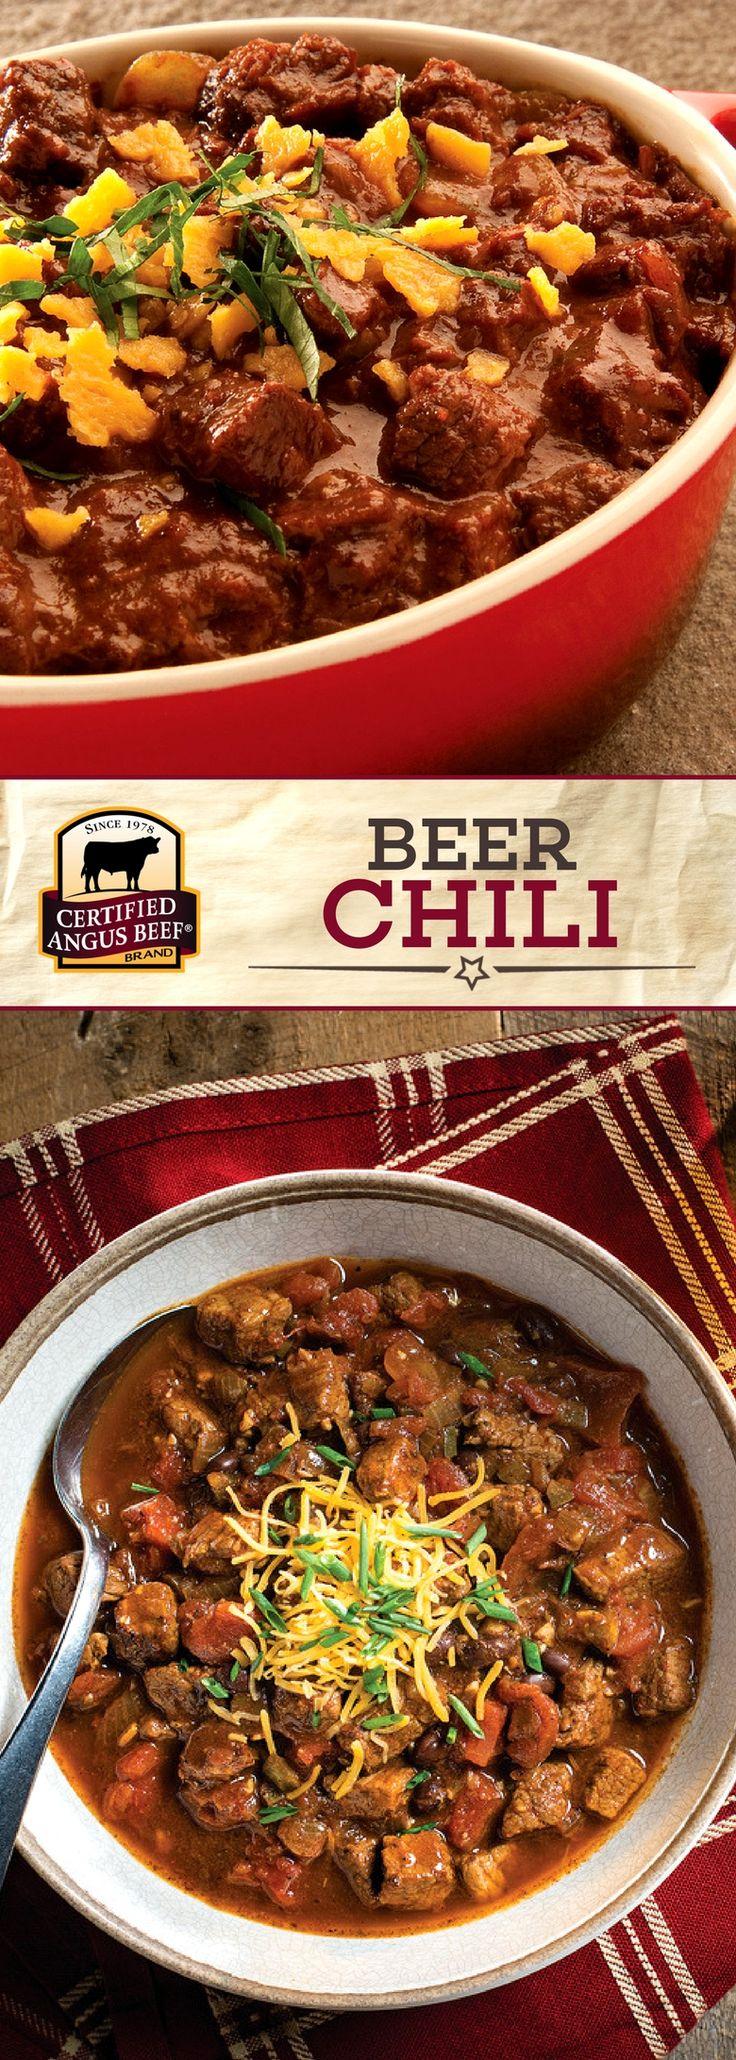 Best 25+ Dark beer ideas on Pinterest | Craft beer, Hops ...